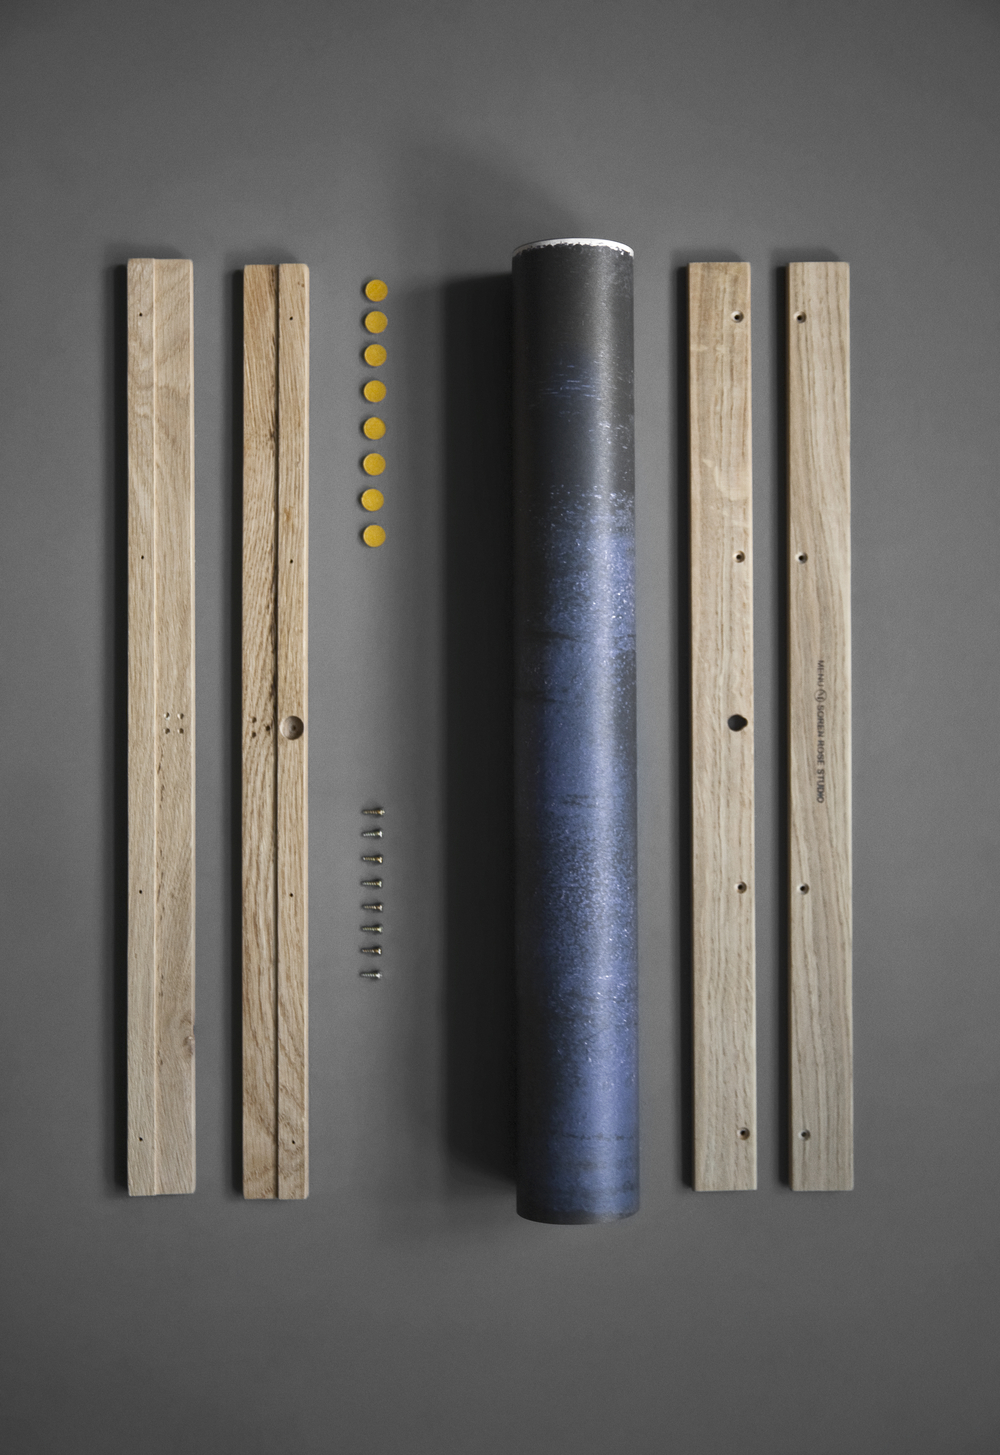 Enter Magazine Holder-w: 27cm x H: 100cm